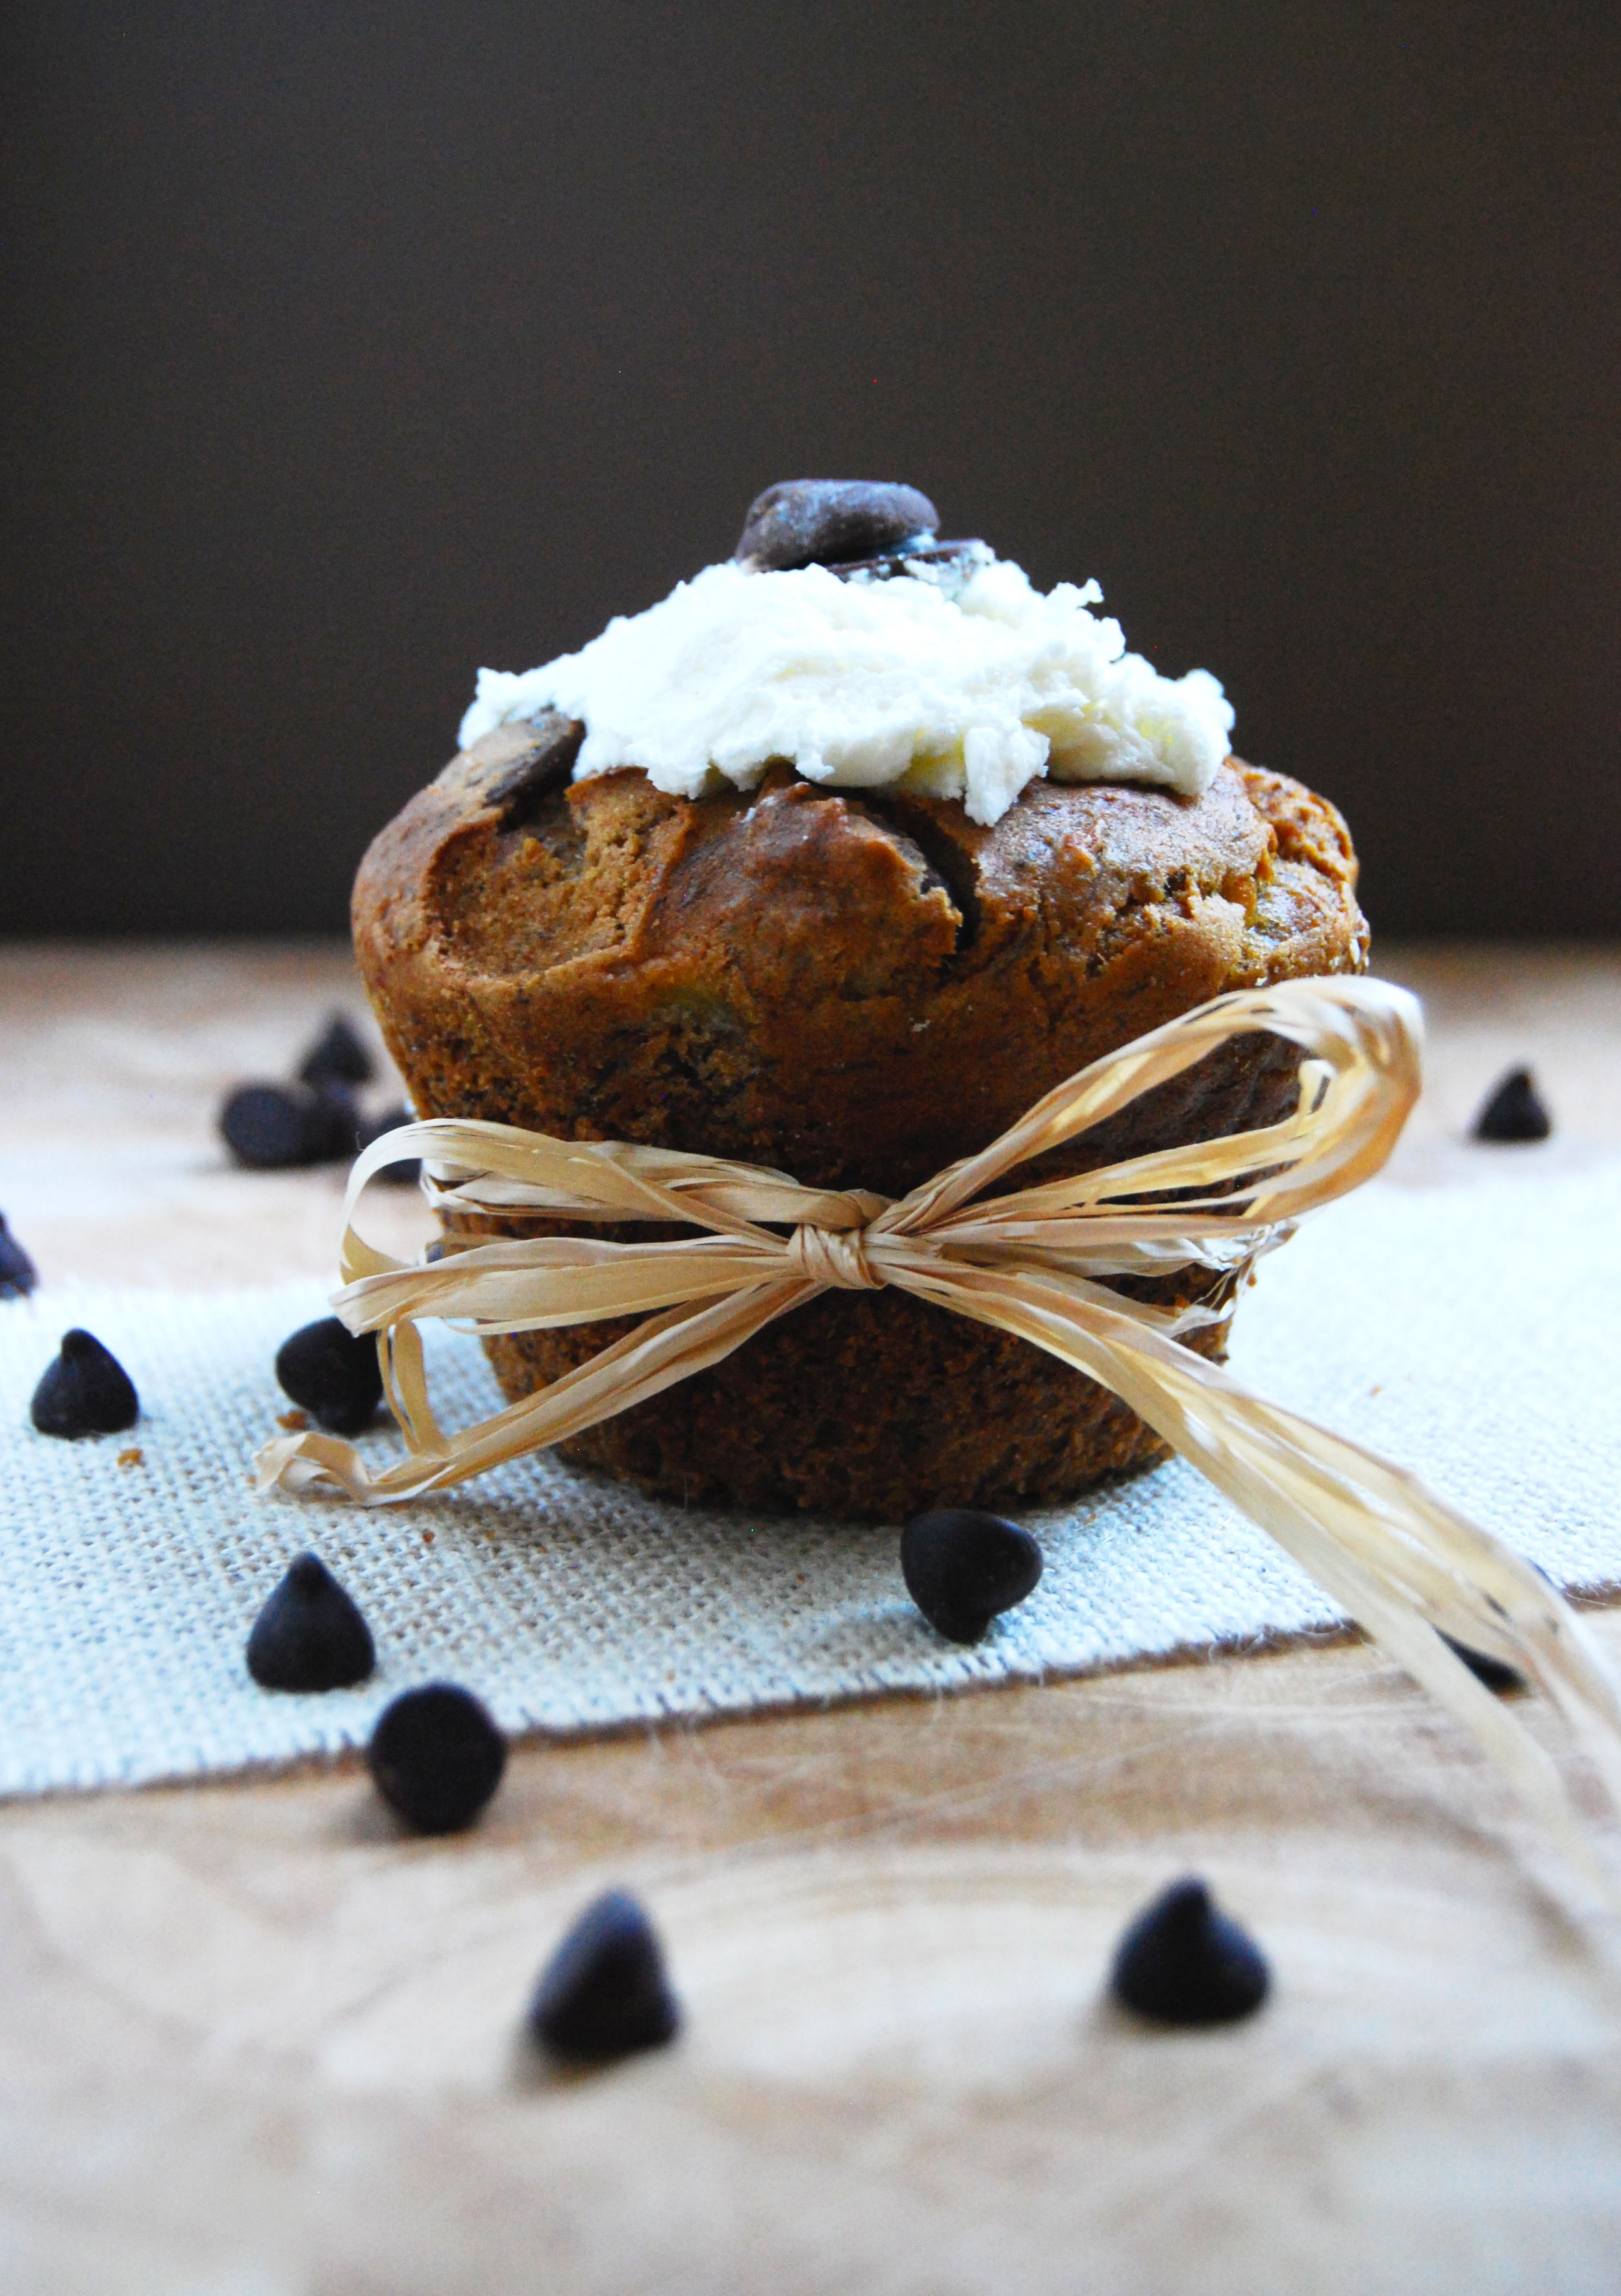 'Just Yummy' Gluten Free Bakery chocolate and banana